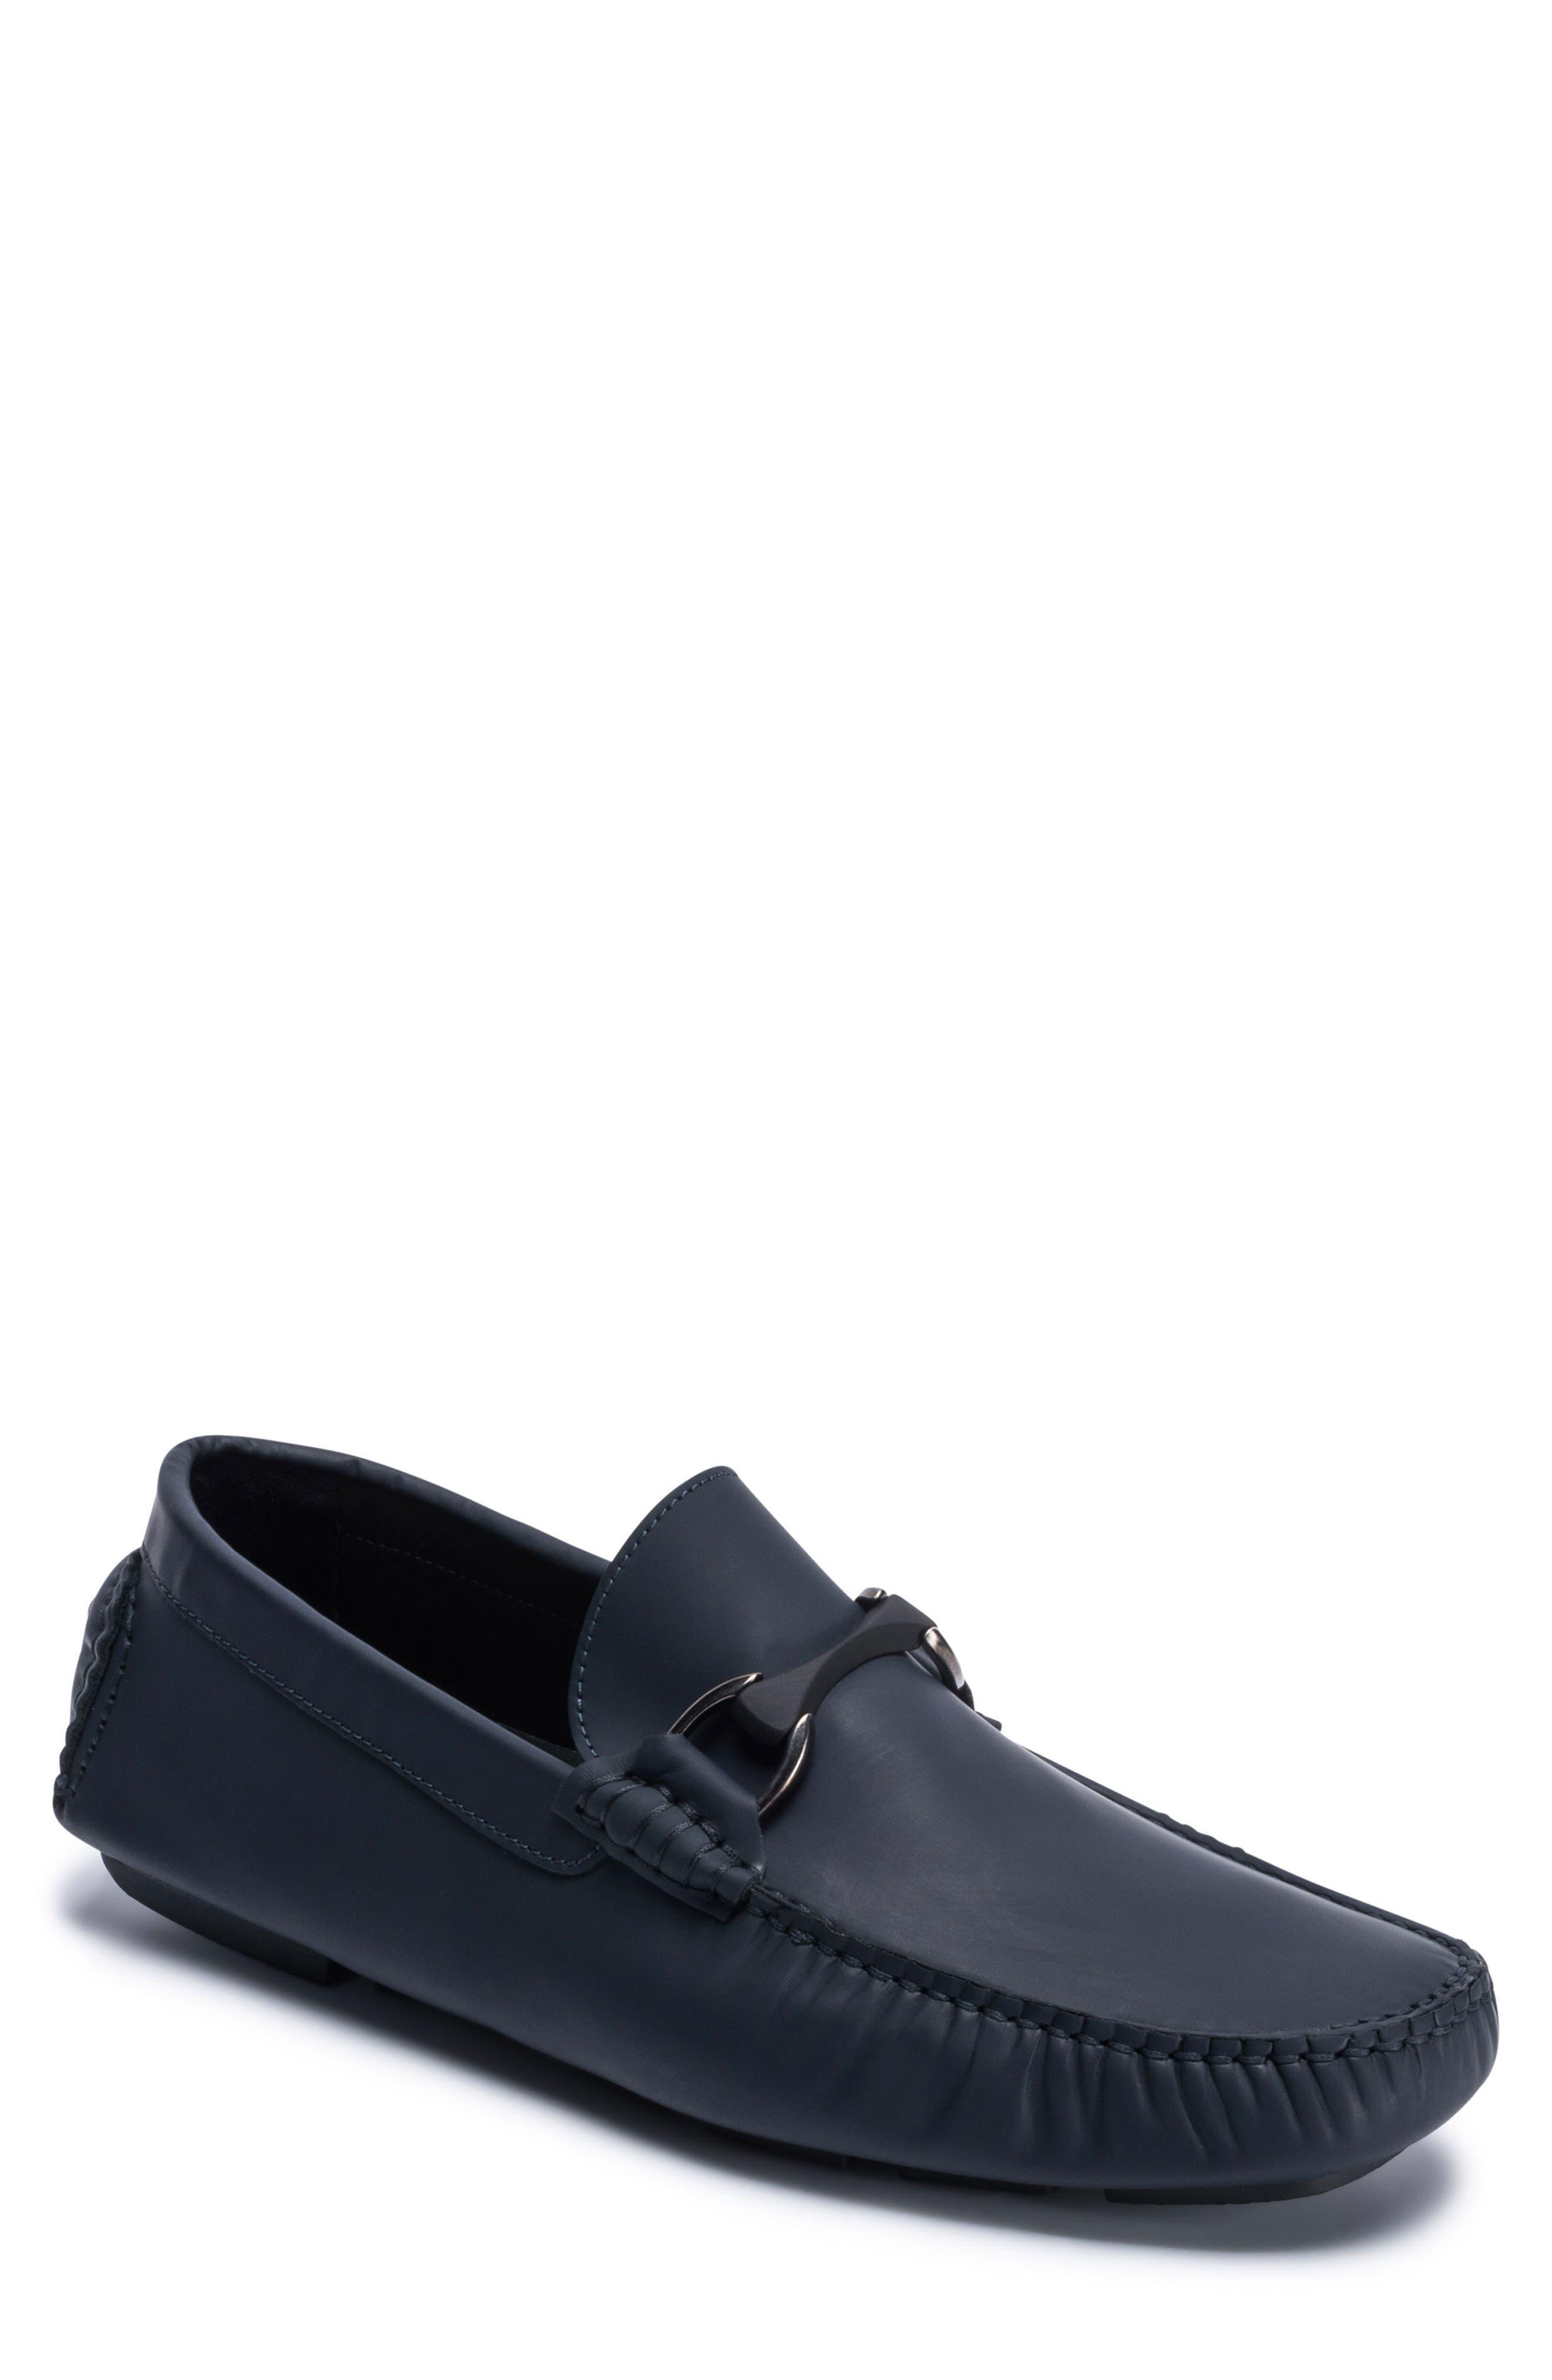 Alternate Image 1 Selected - Bugatchi Sanremo Driving Shoe (Men)